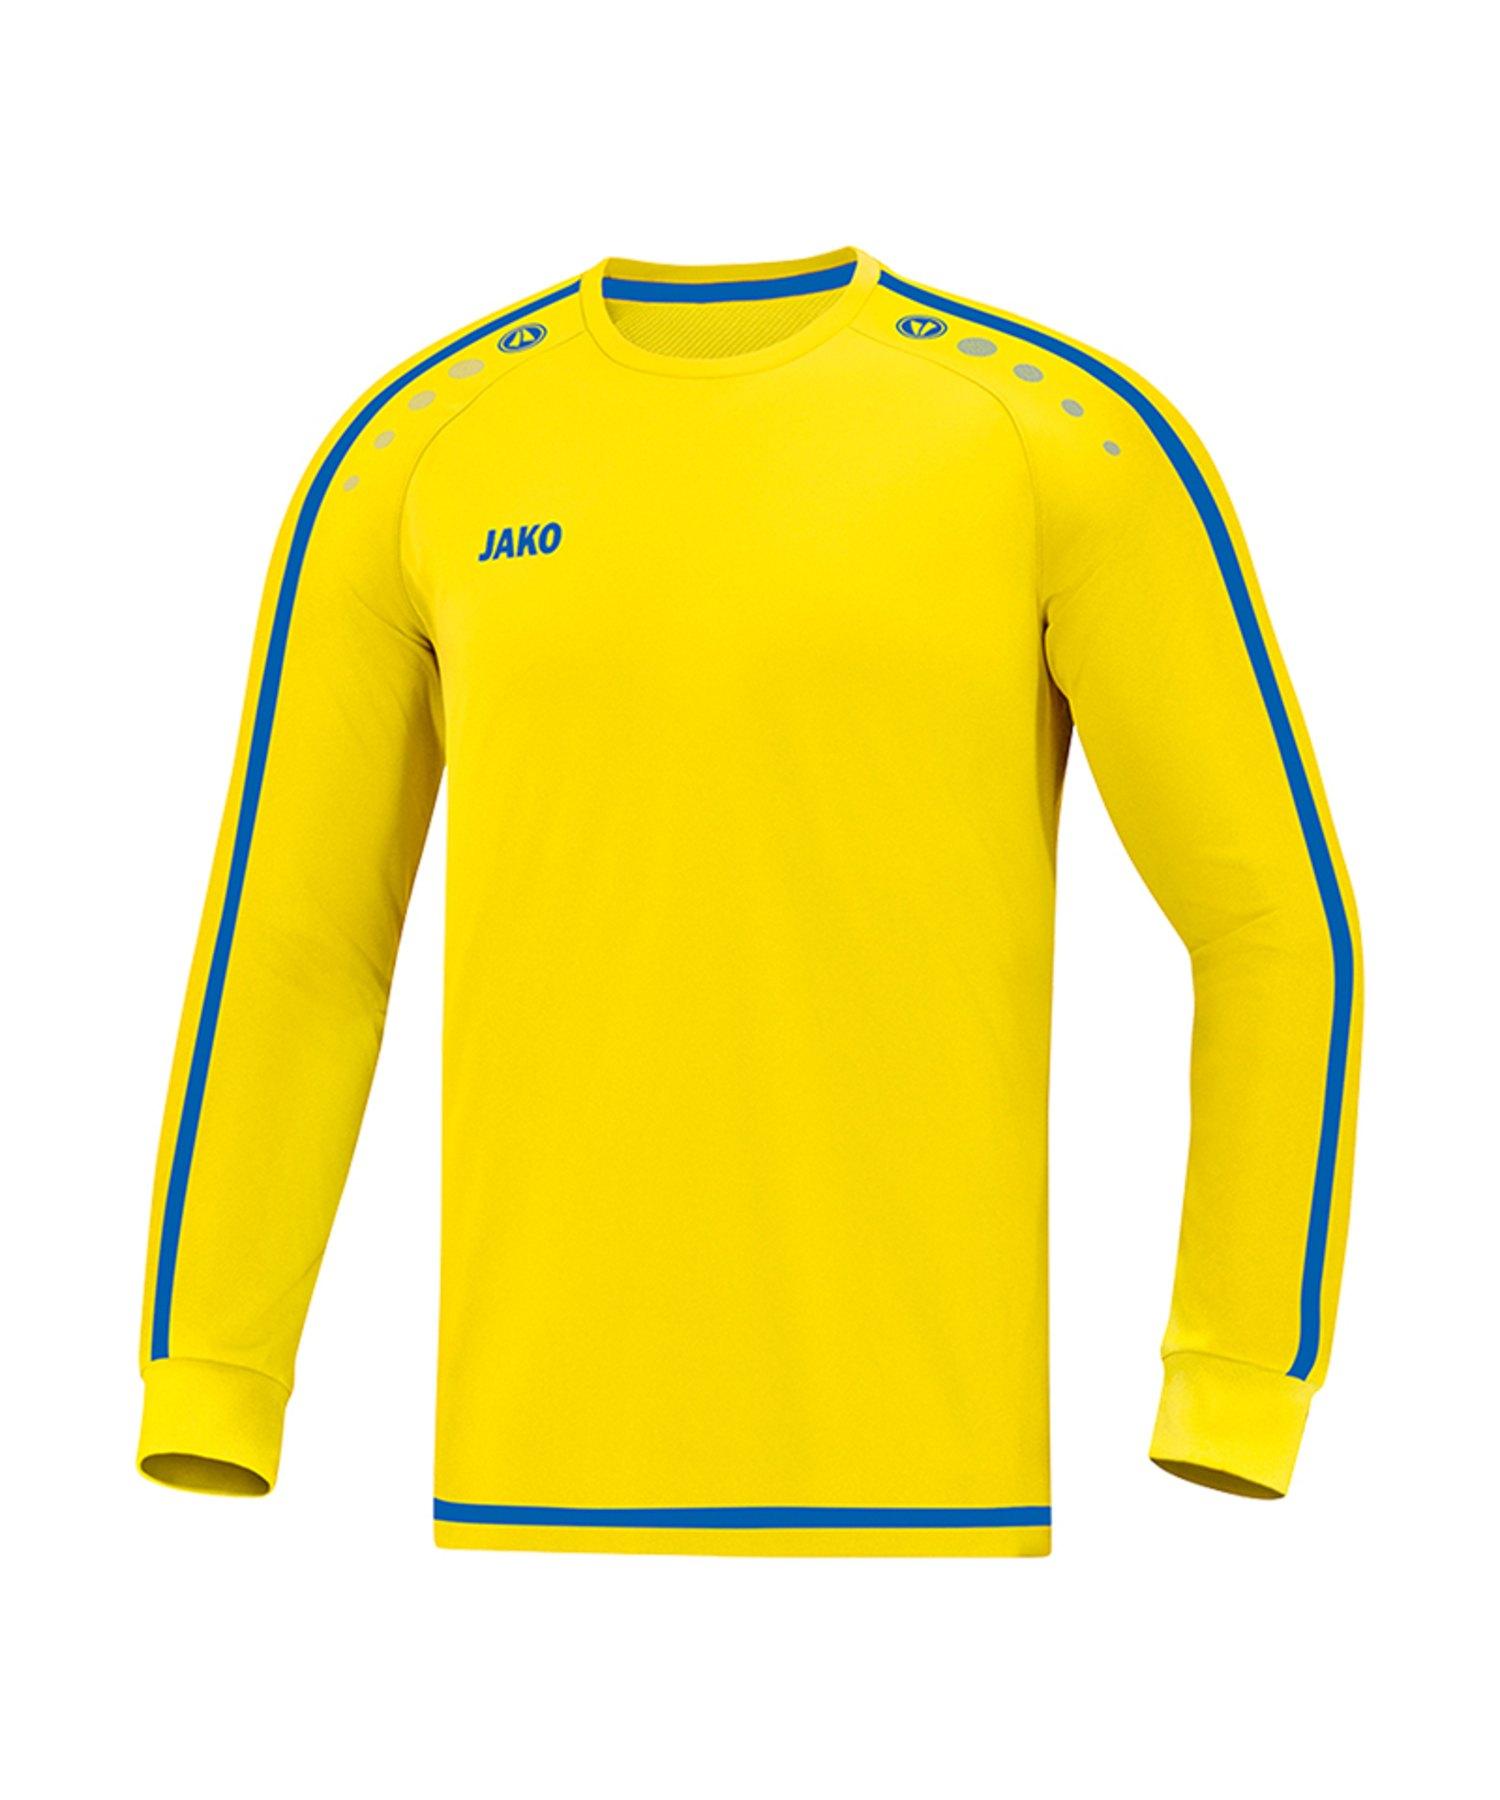 Jako Striker 2.0 Trikot langarm Gelb Blau F12 - Gelb